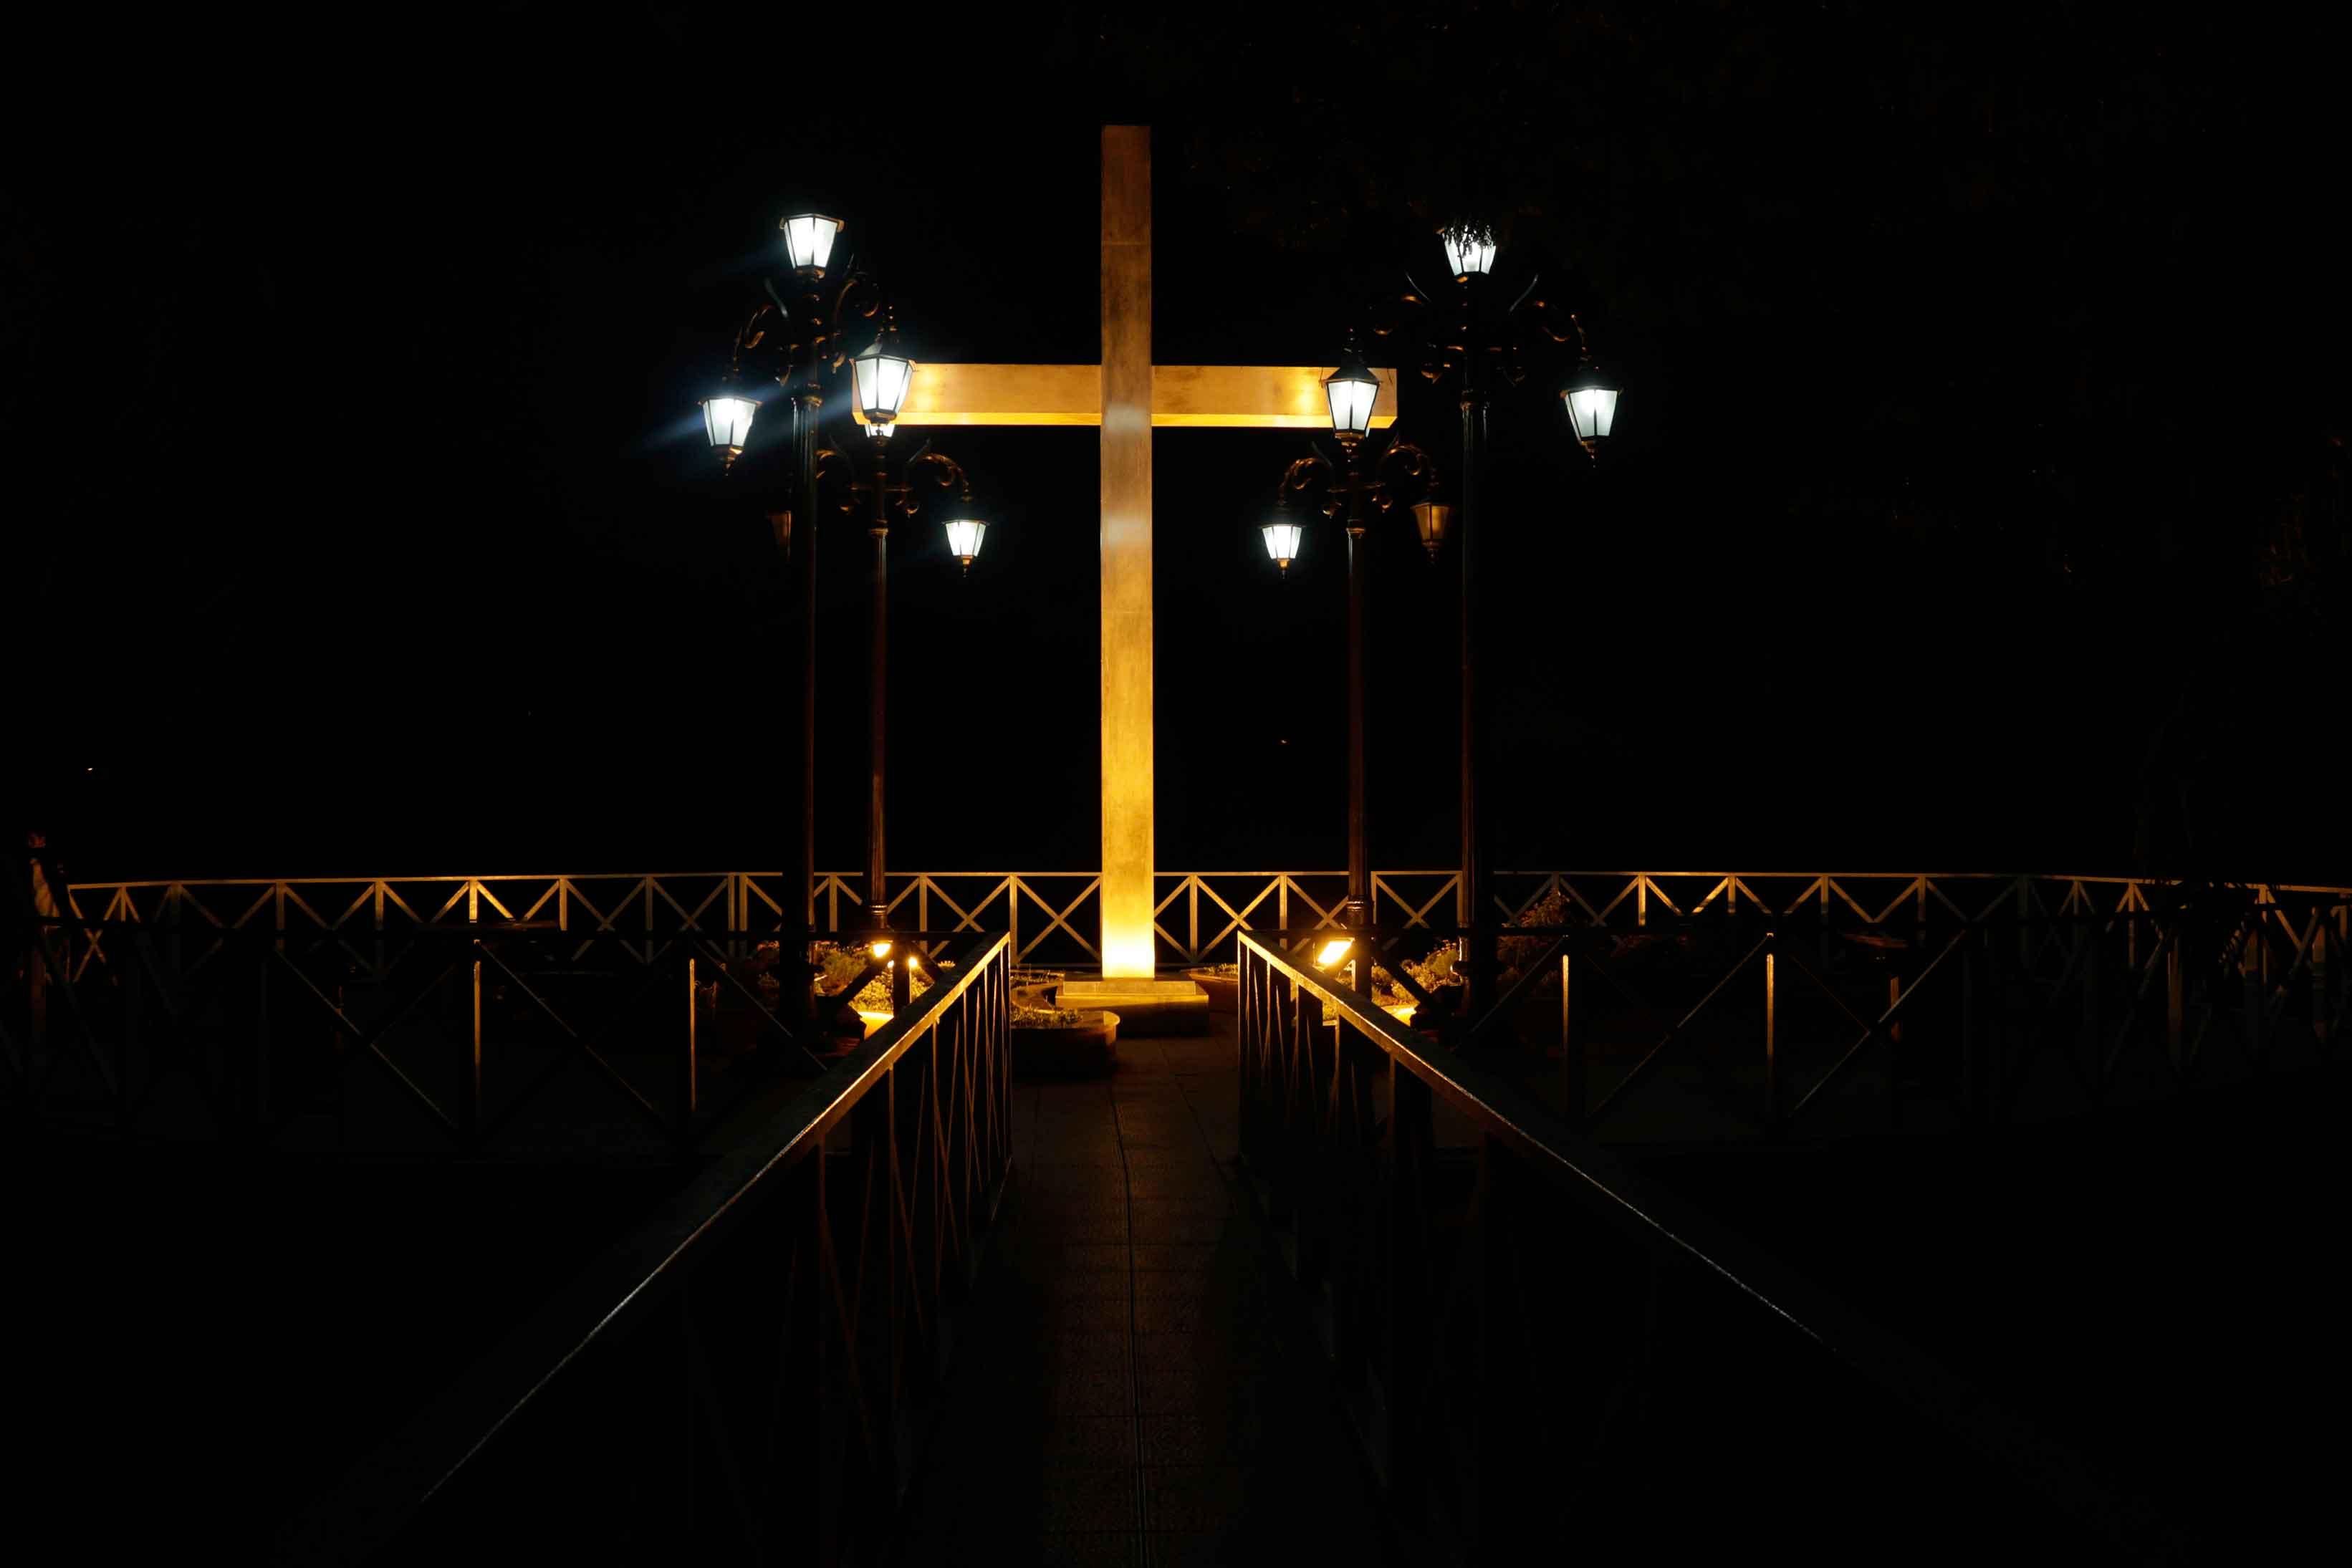 Mirante do Cruzeiro-Santo-Antonio-do-Pinhal-Turismo-Religioso-_MG_6127-bx